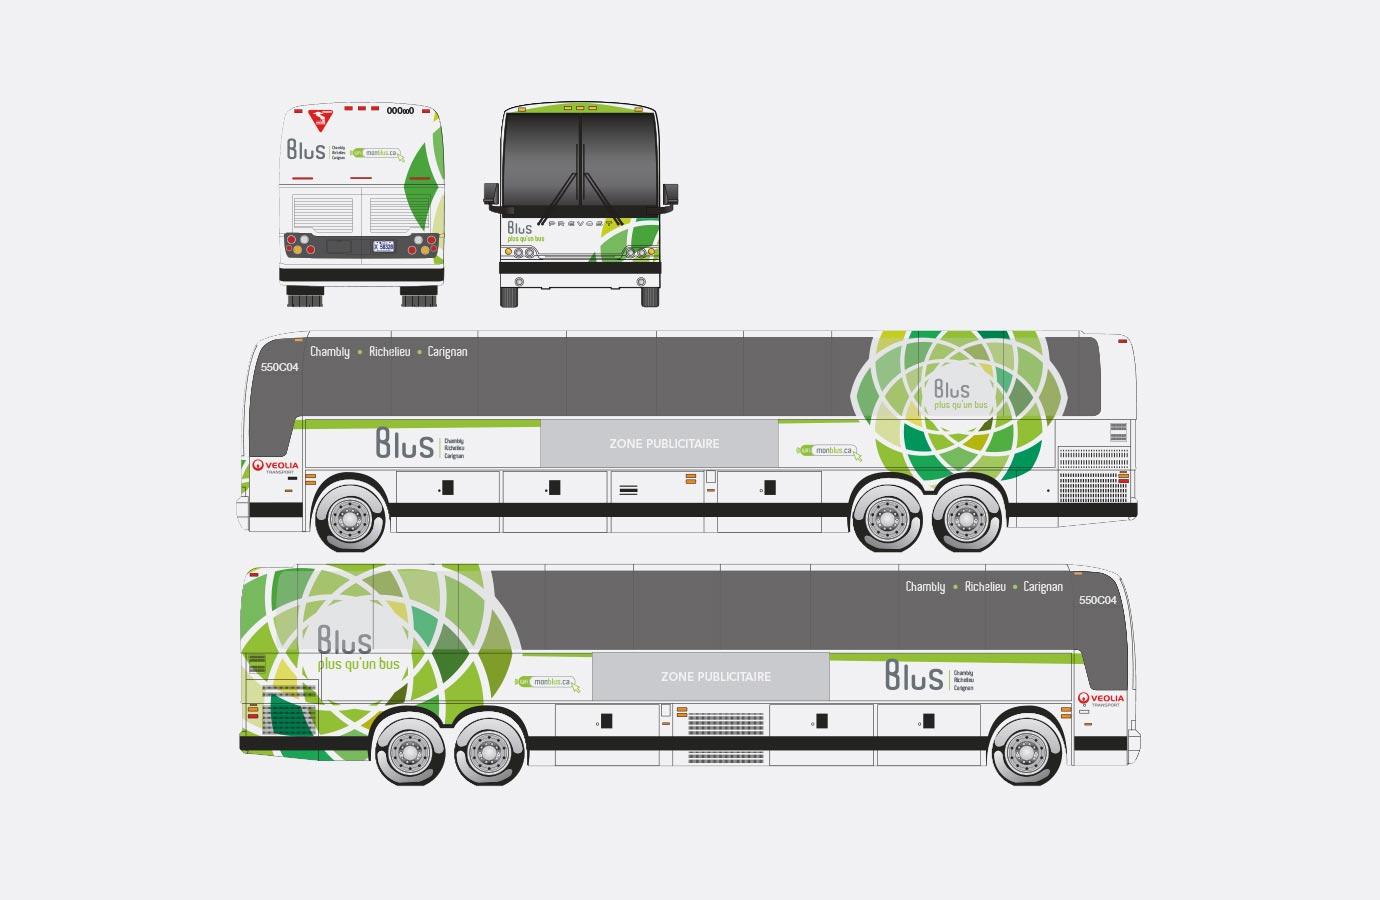 Lettrage des autobus Blus, version verte